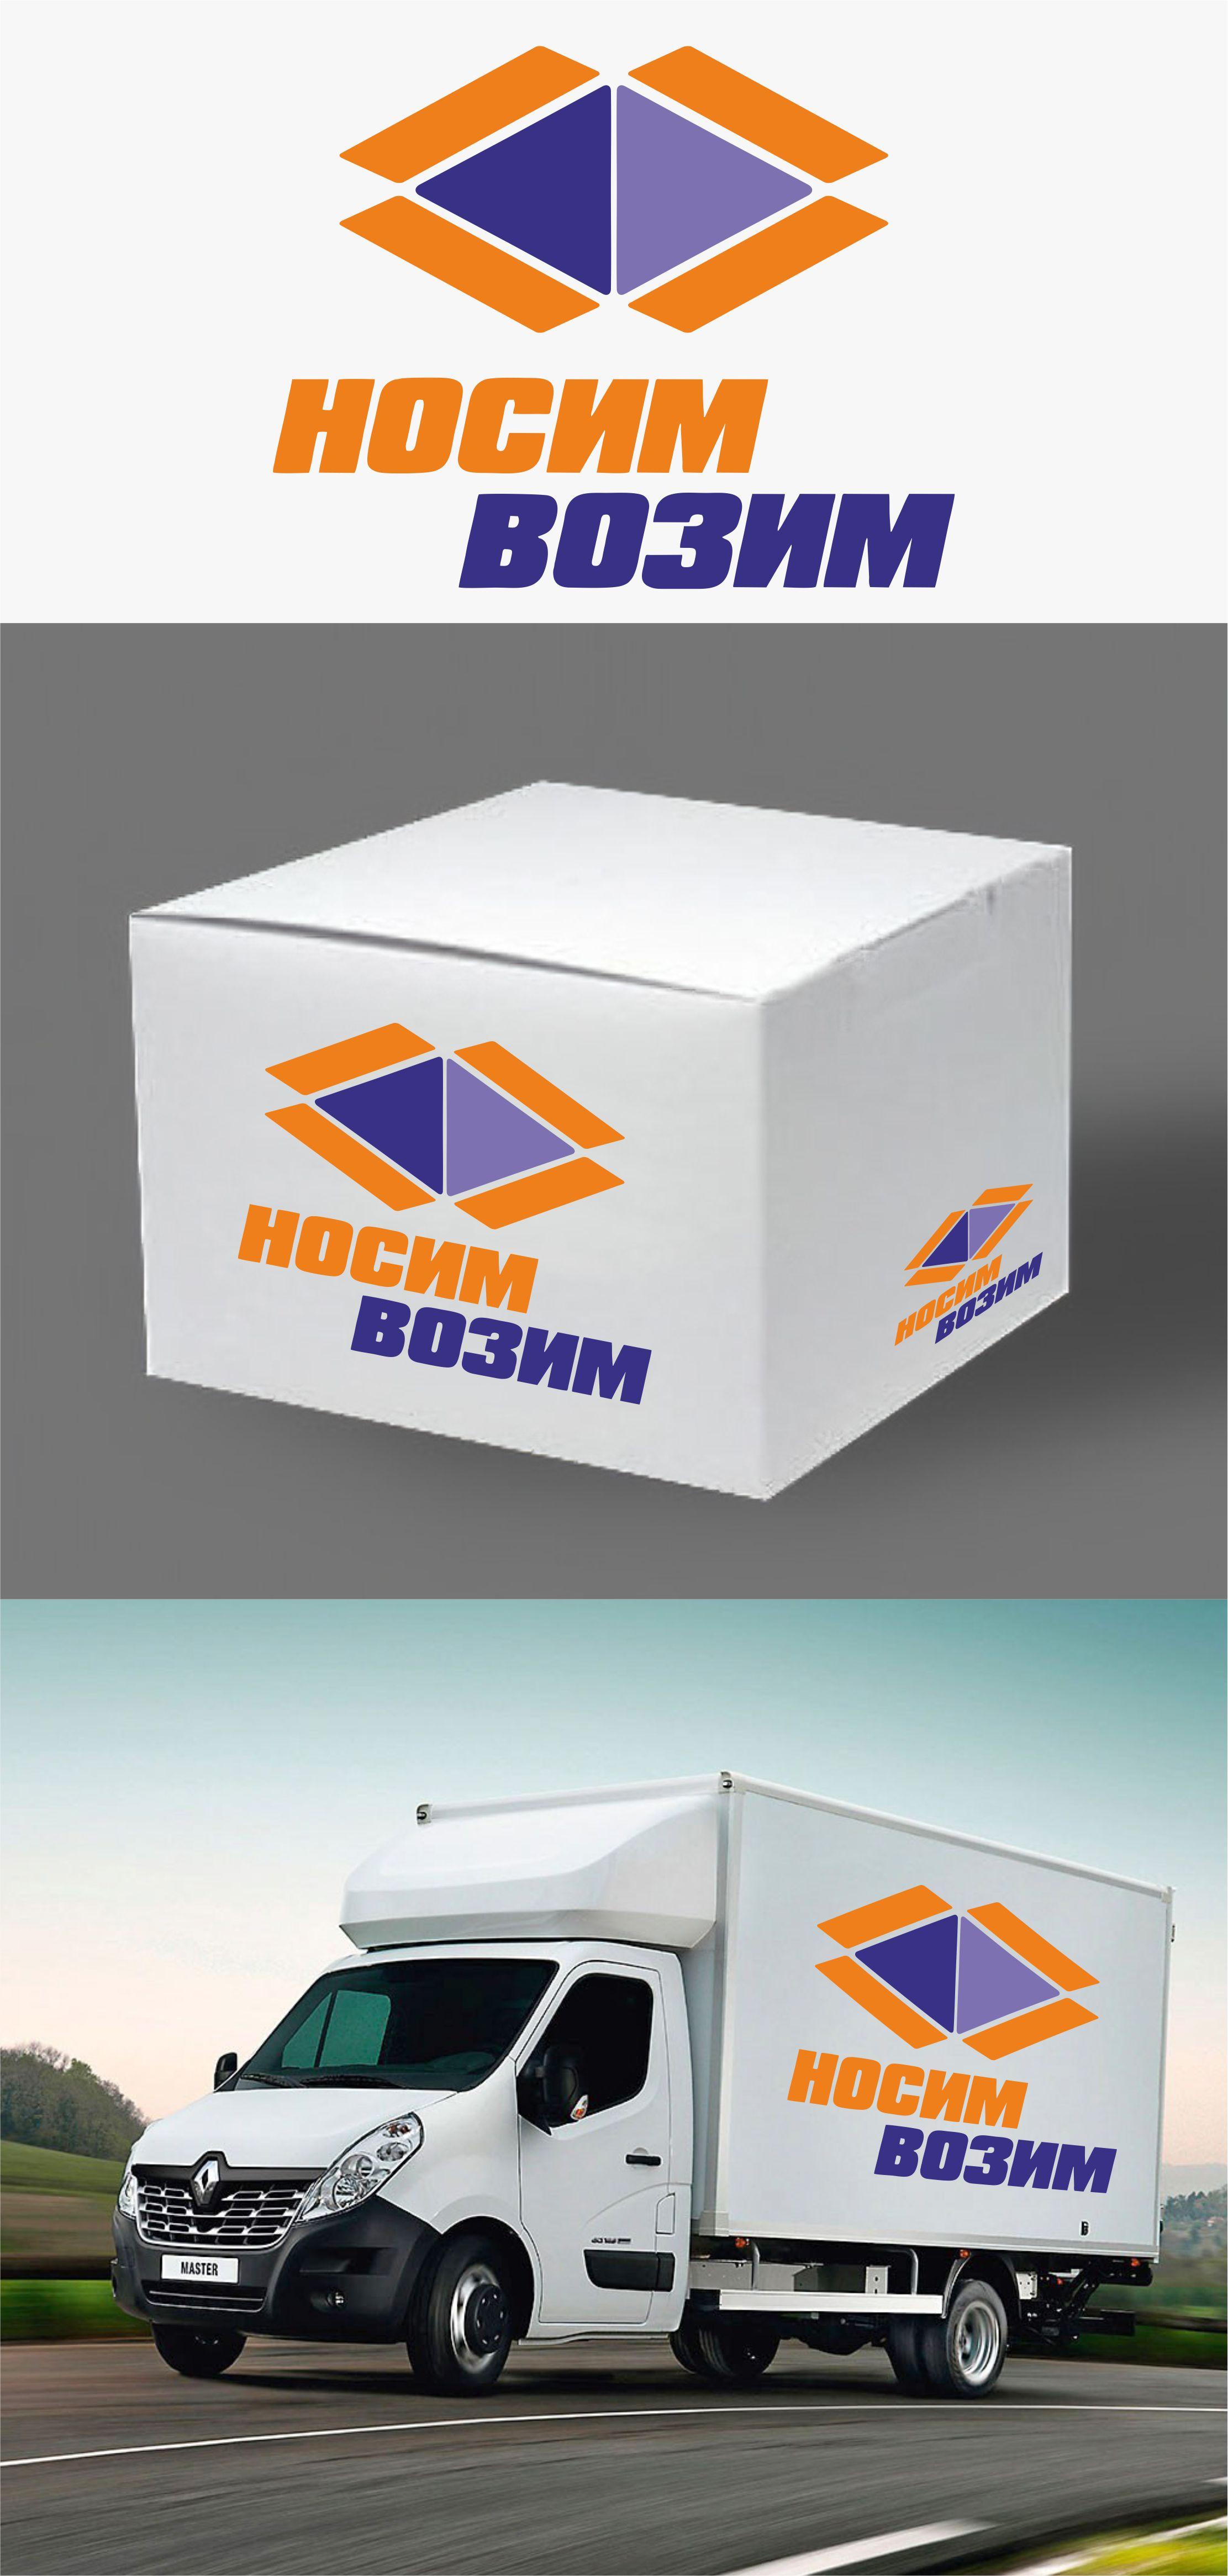 Логотип компании по перевозкам НосимВозим фото f_7545cf914cda9e0f.jpg